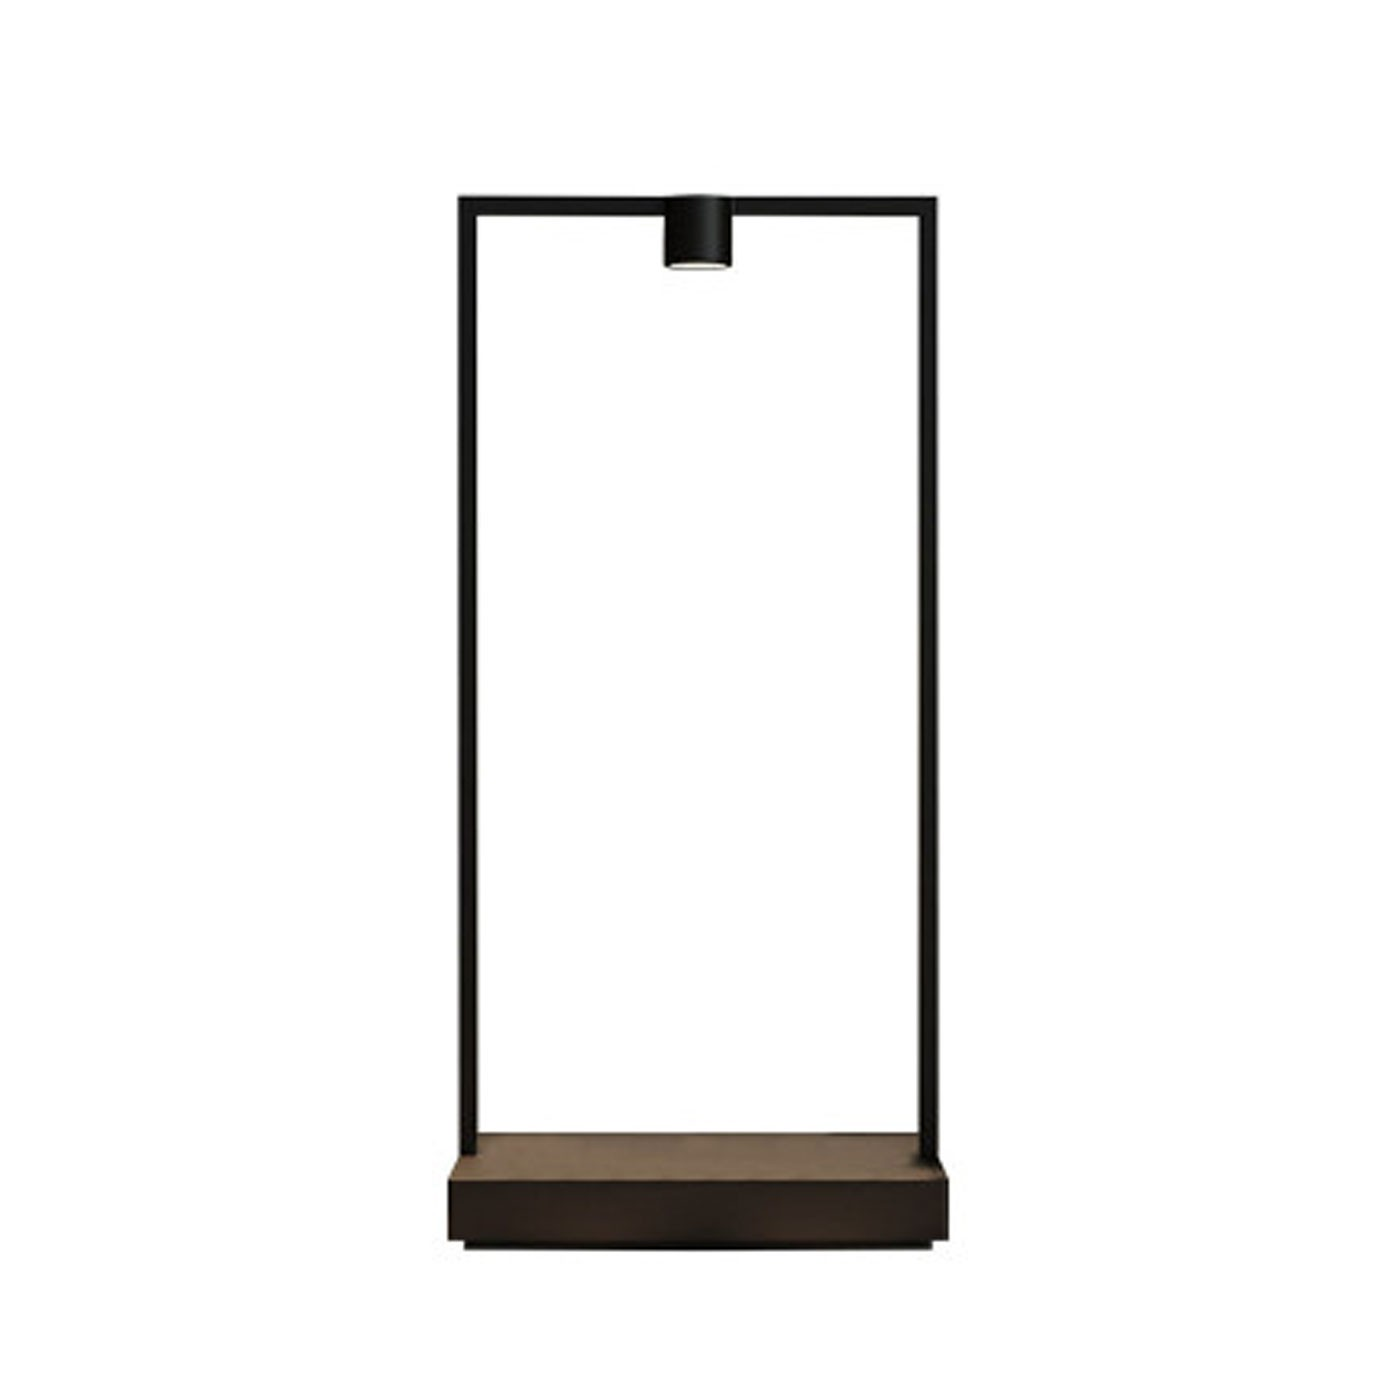 Curiosity 36 Black Table Lamp - Artemide | Eataly.com